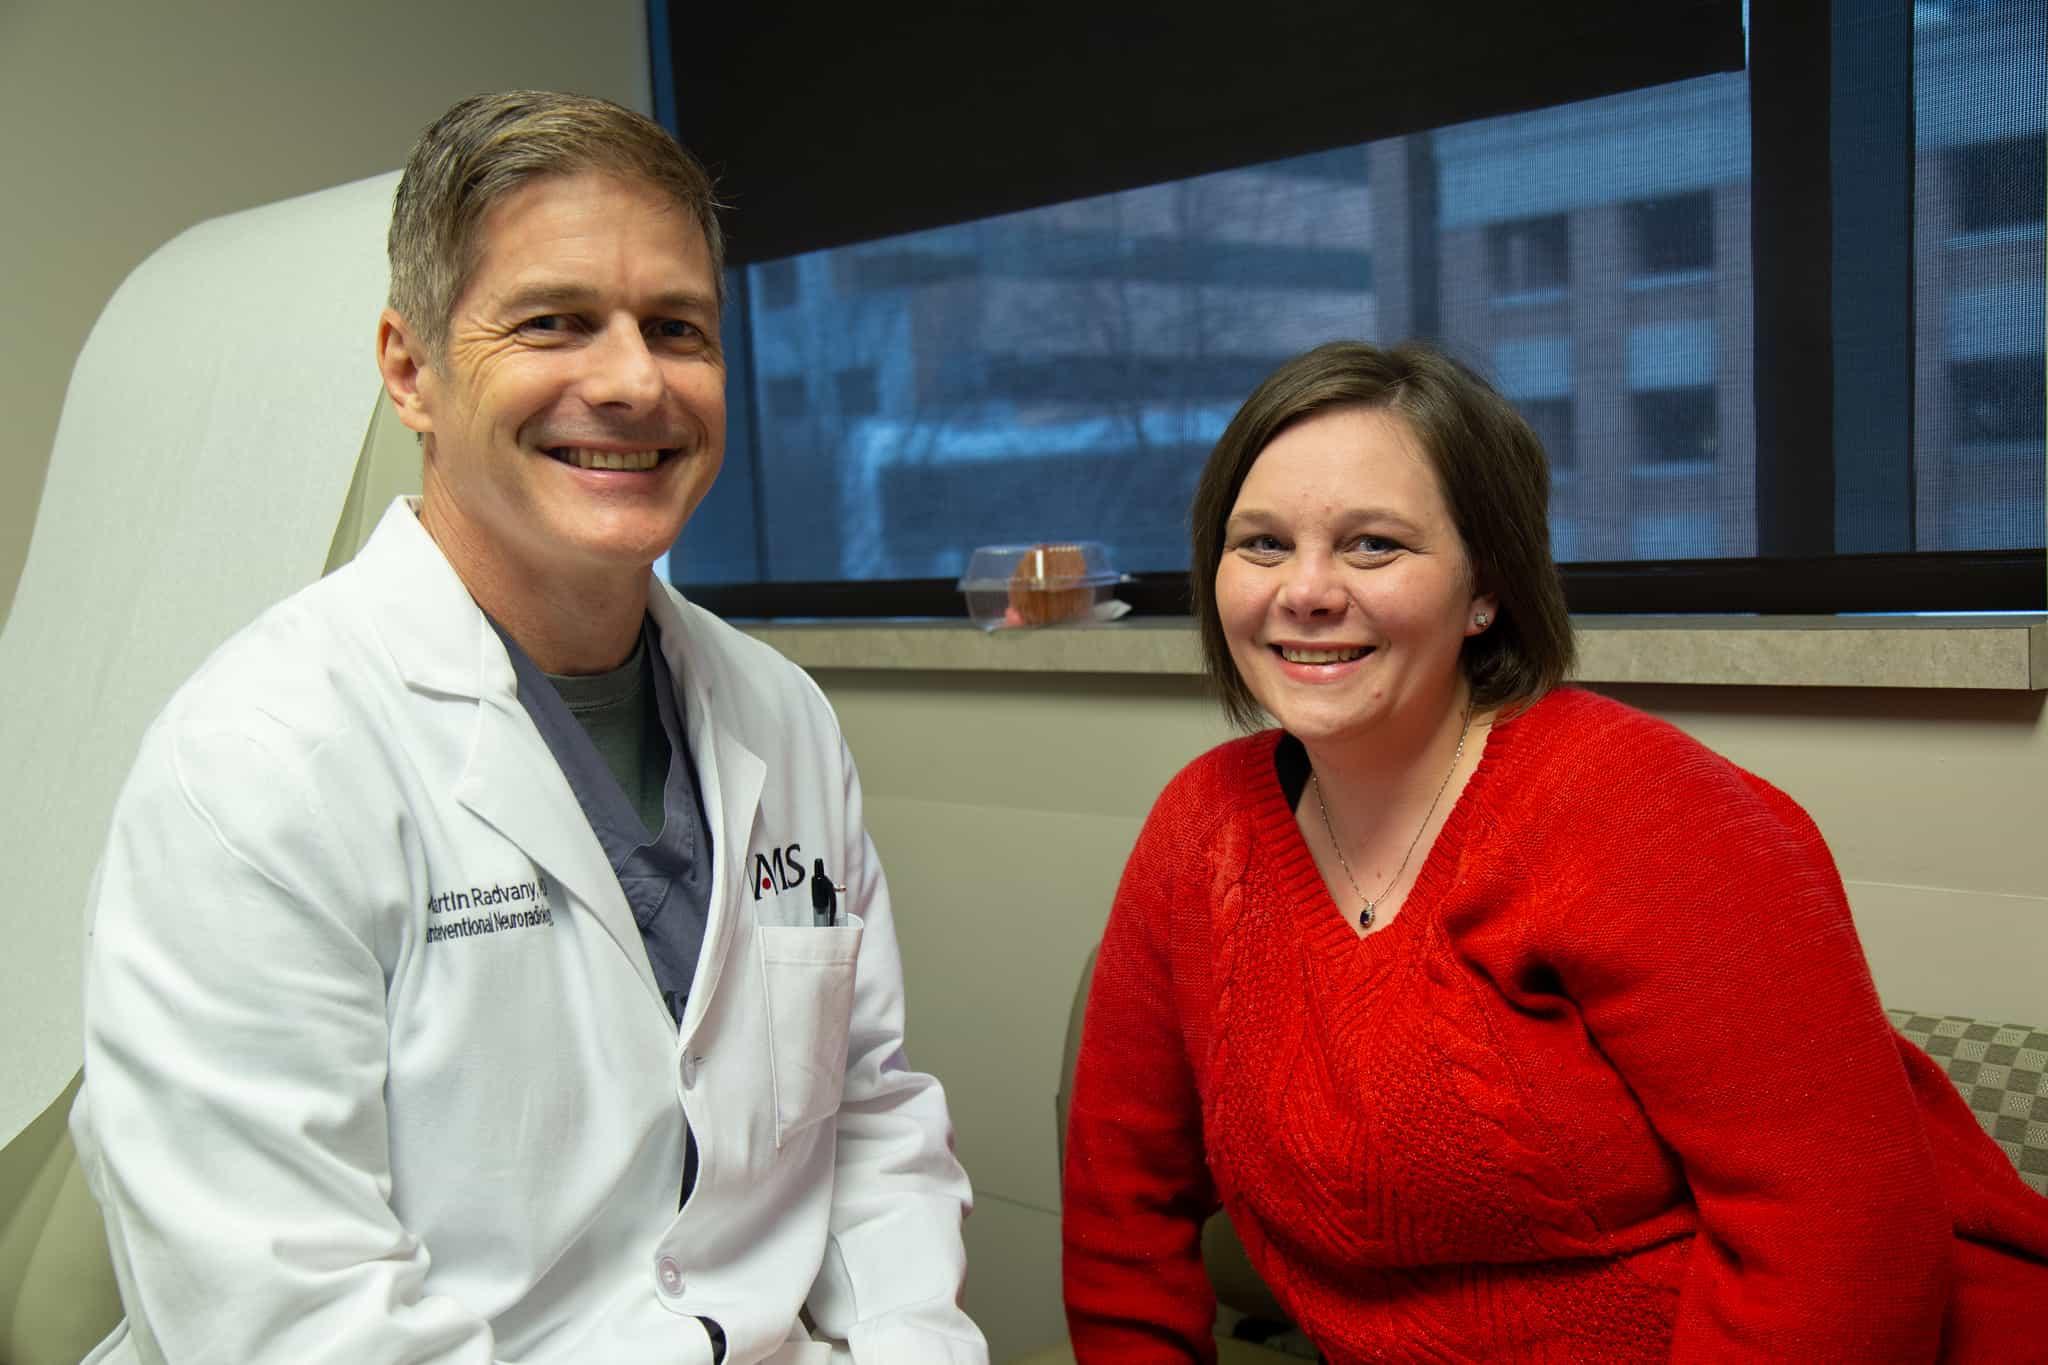 Physician Treats Rare Cerebrovascular Disease, Restores Patient's